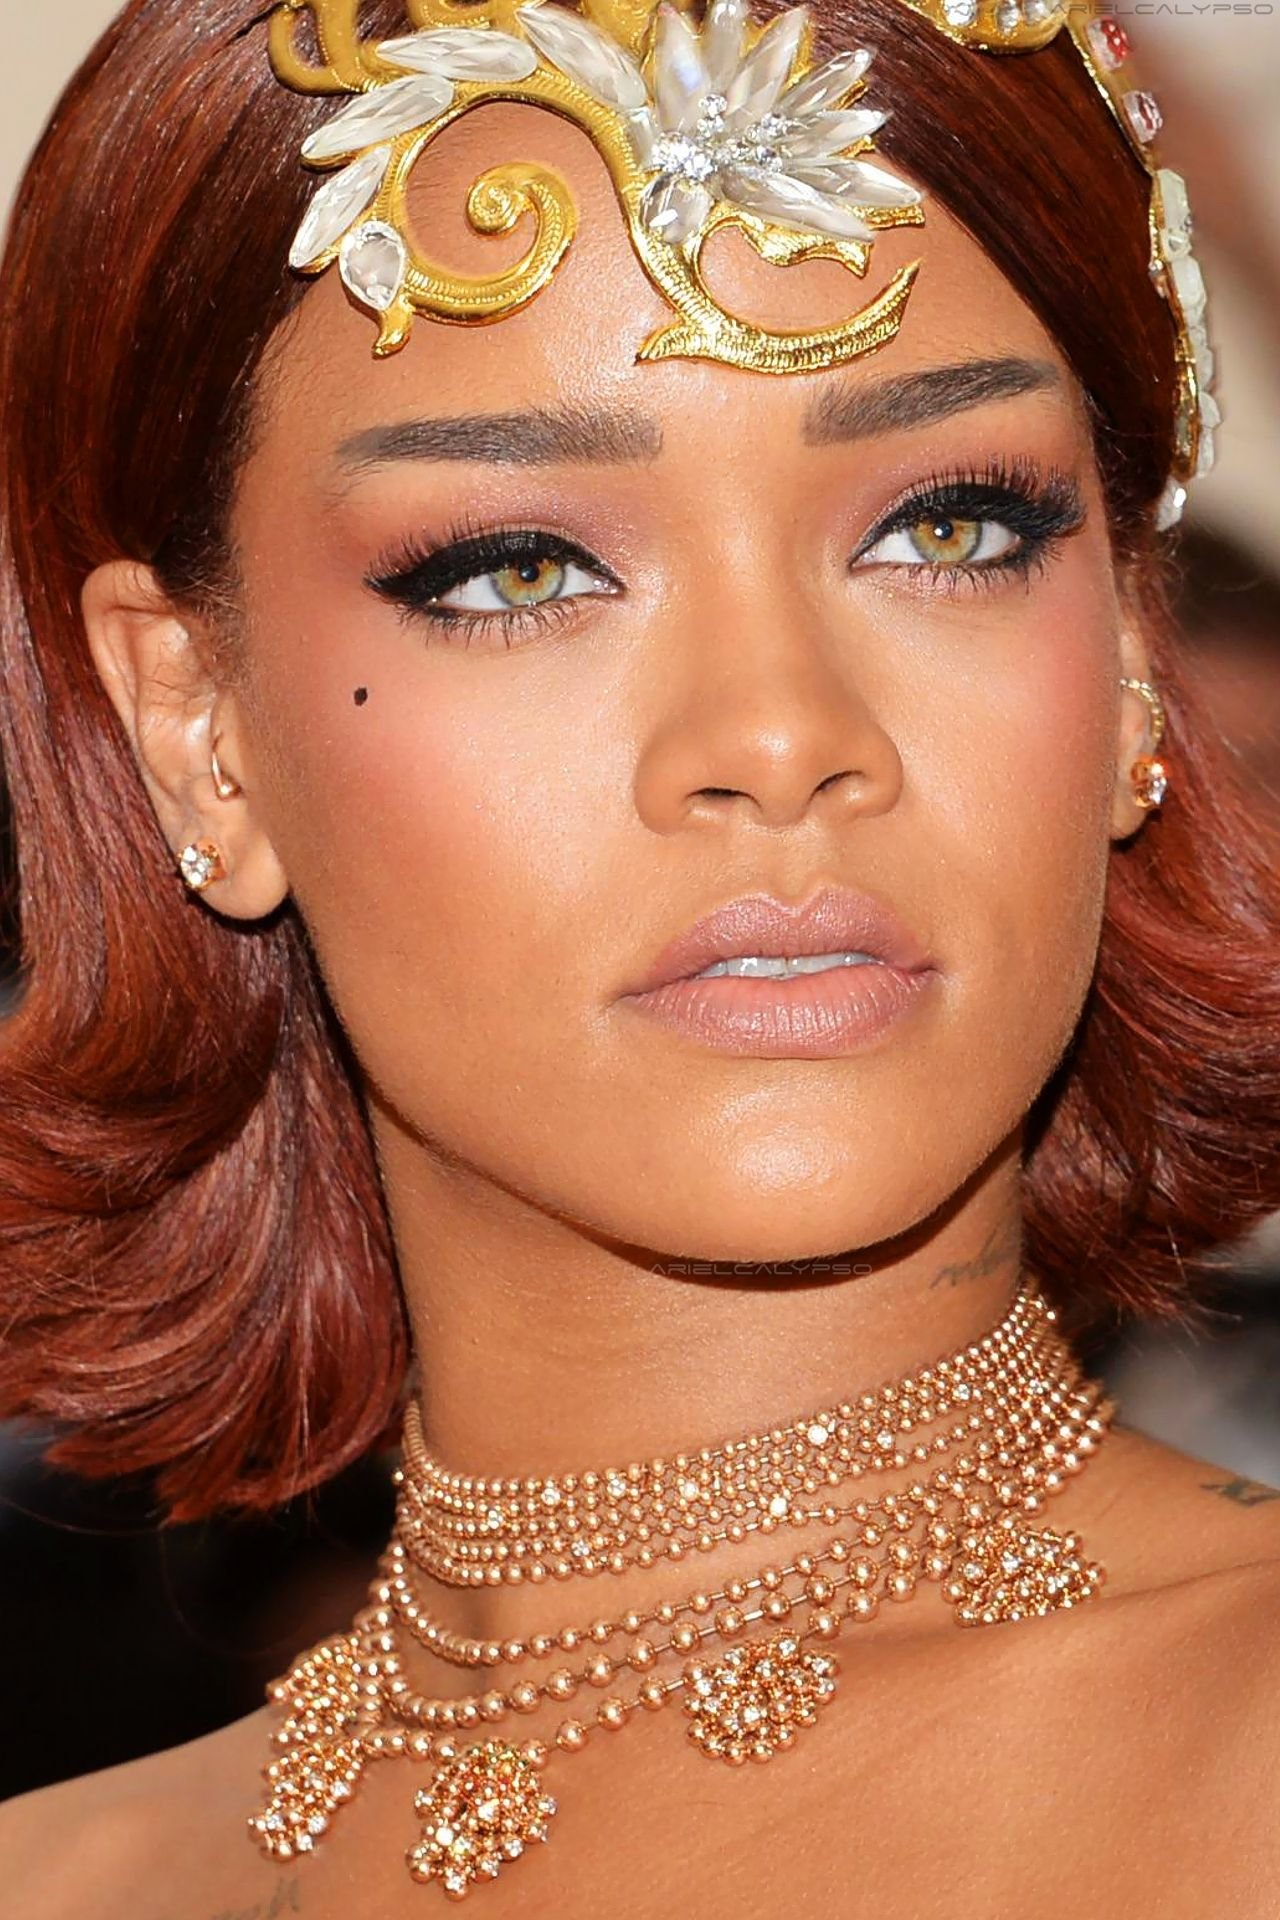 Robyn Rihanna Fenty   R O O T S   Rihanna costume, Rihanna ...